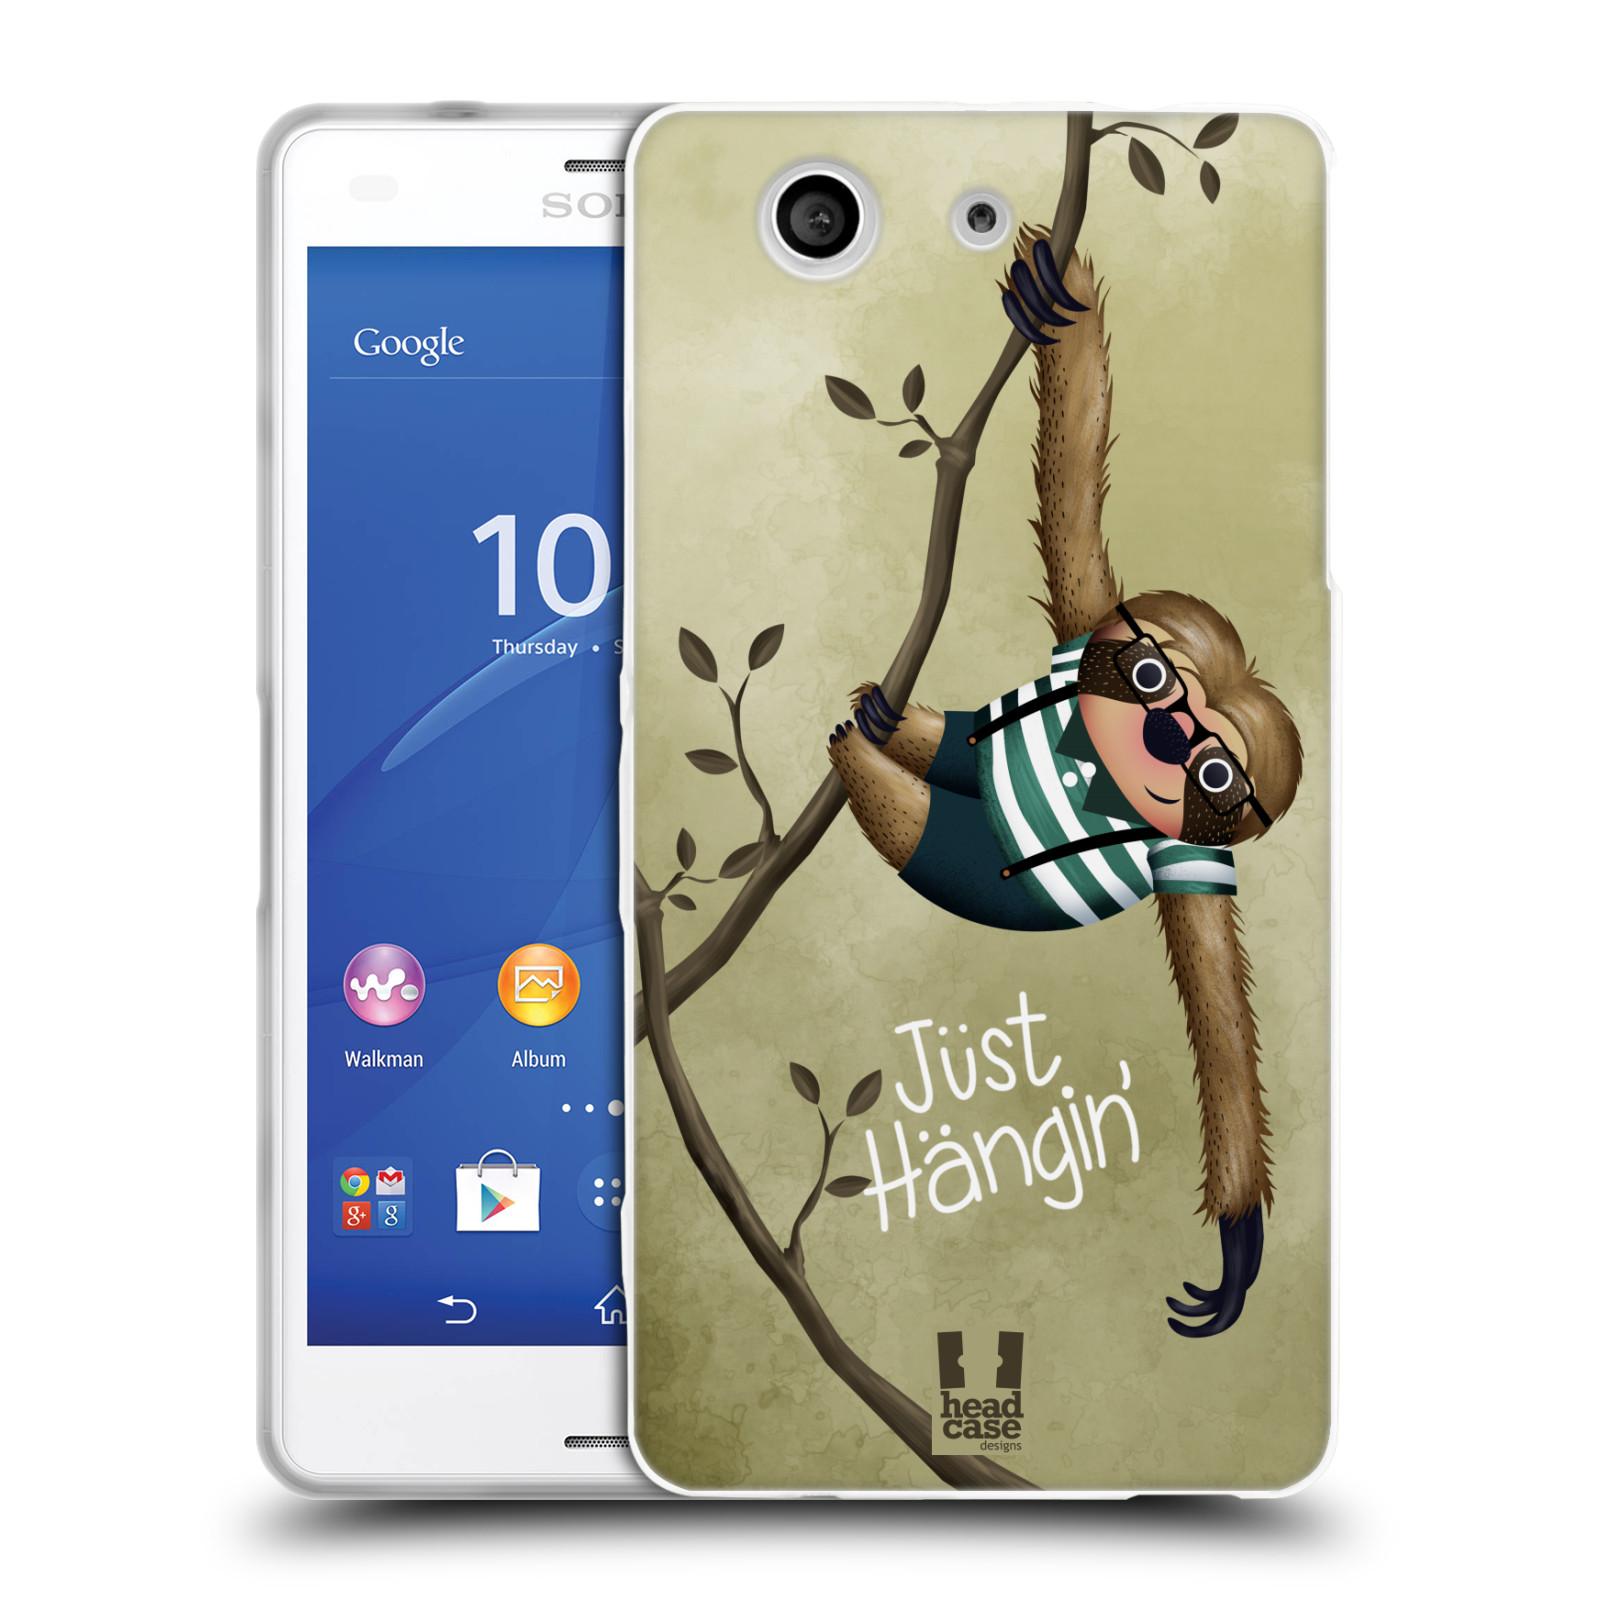 Silikonové pouzdro na mobil Sony Xperia Z3 Compact D5803 HEAD CASE Lenochod Just Hangin